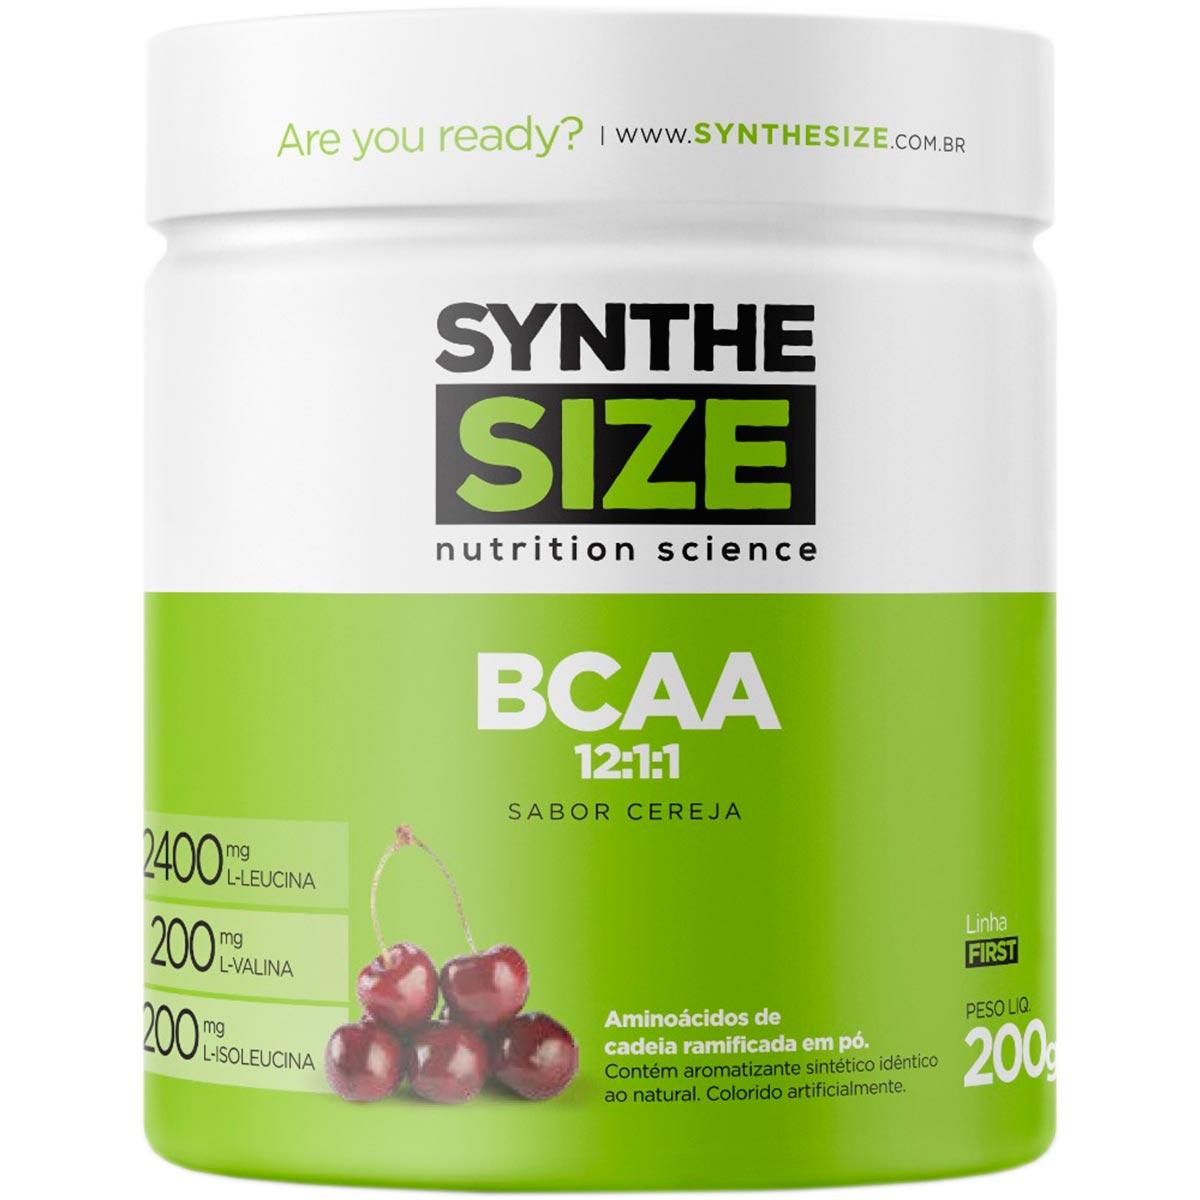 Bcaa Powder 12:1:1 200g - Synthesize